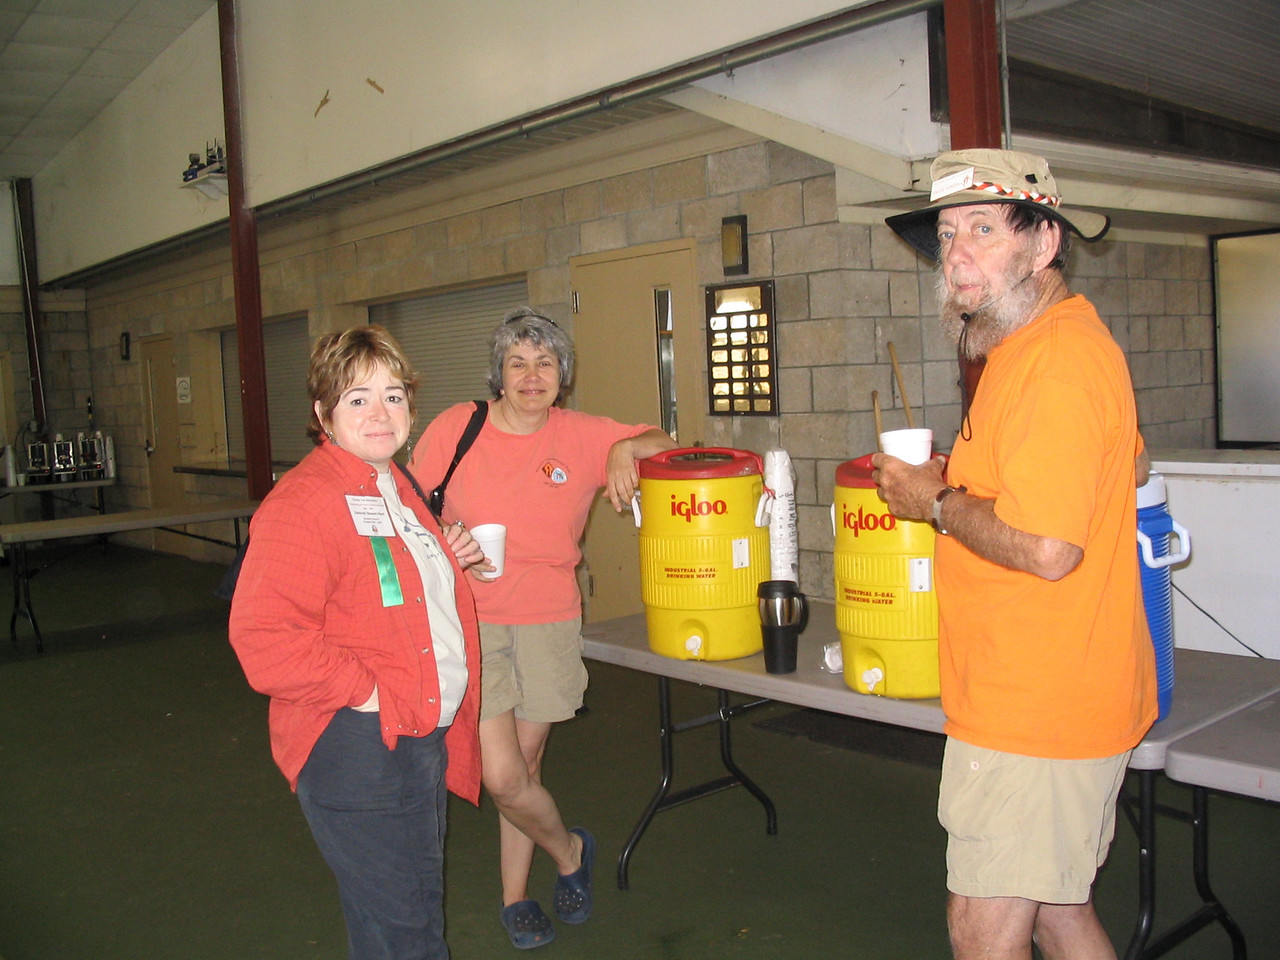 Deborah Stewart-Kent, Paula Snellgrove, and Swede Hansen around the water cooler<br /> PHOTO CREDIT: Diane Wilkins / Florida Trail Association